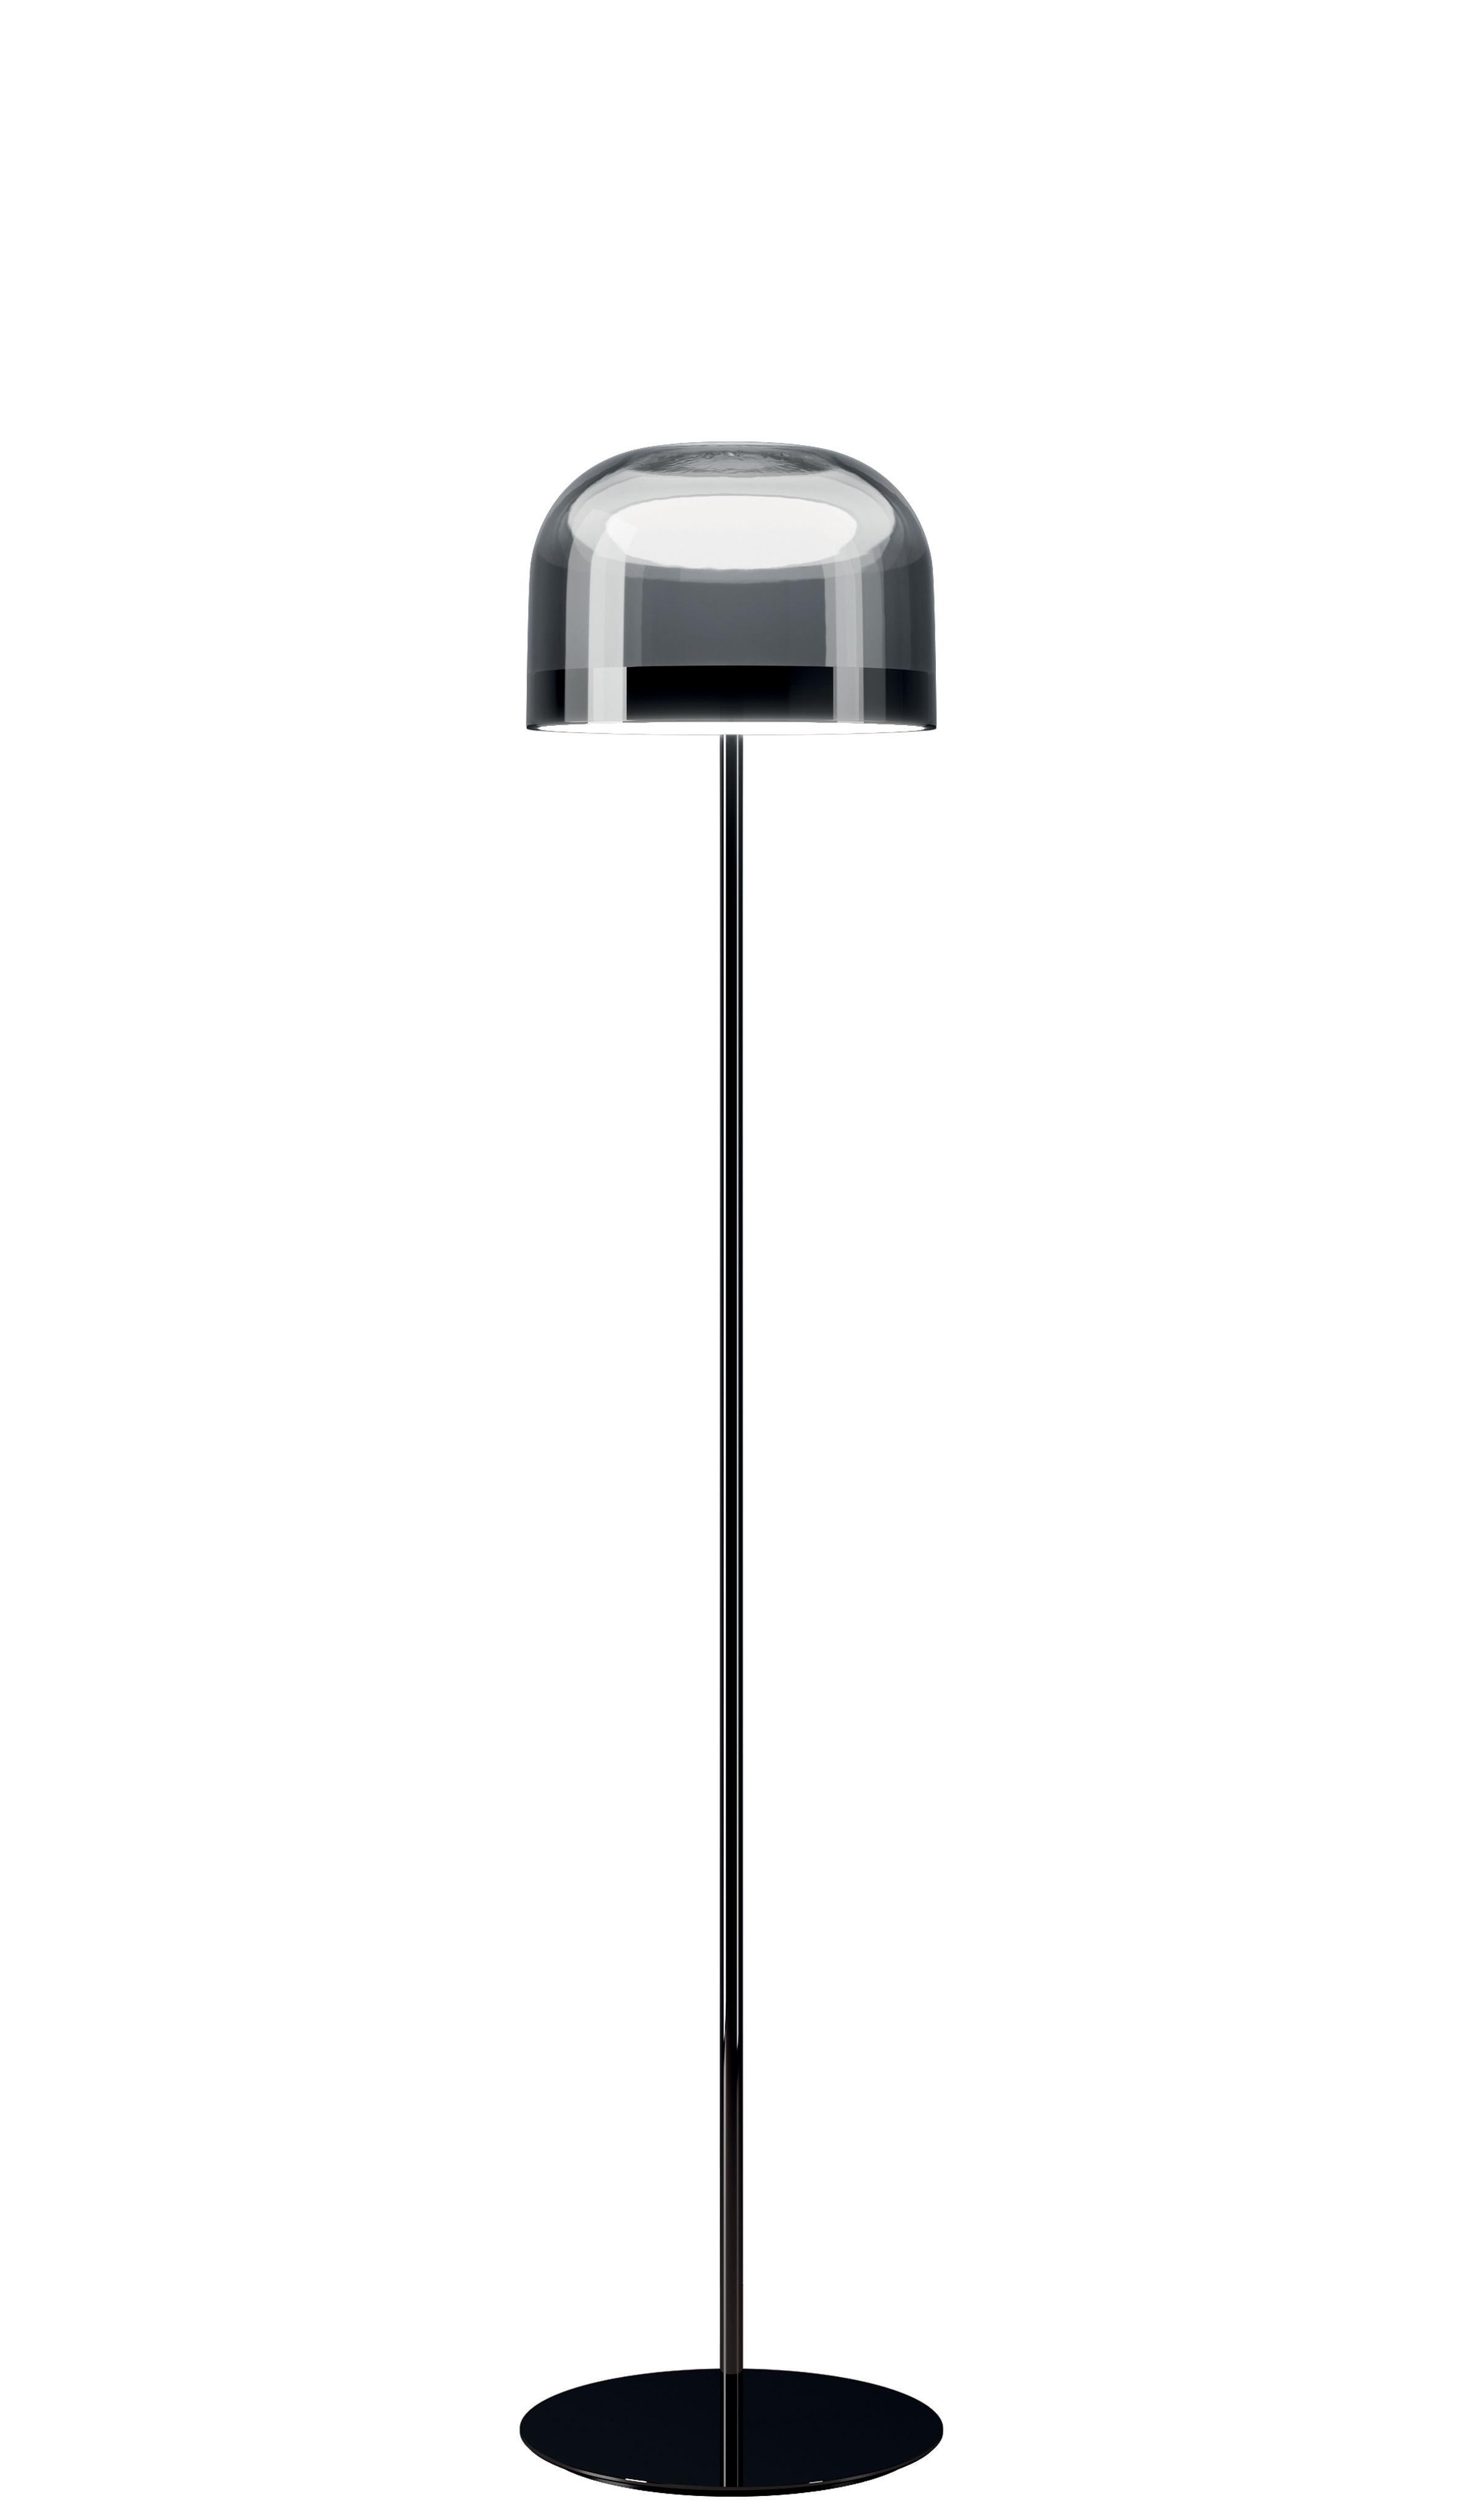 Lighting - Floor lamps - Equatore small Floor lamp - / LED - Glass - H 135 cm by Fontana Arte - H 135 cm / Chromed & grey - Blown glass, Metal